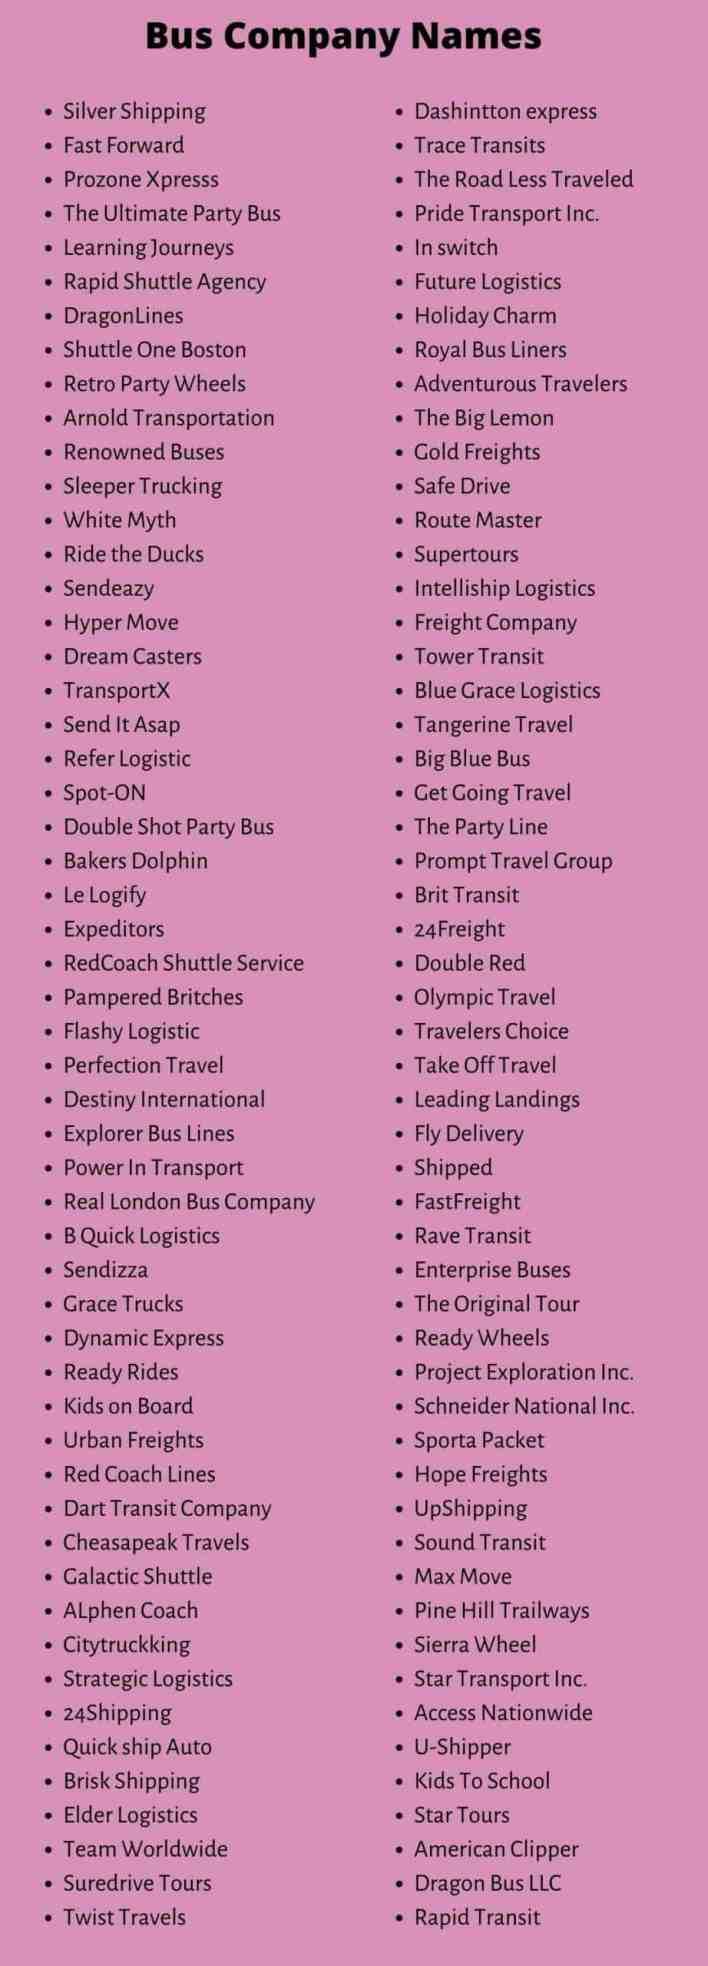 Bus Company Names